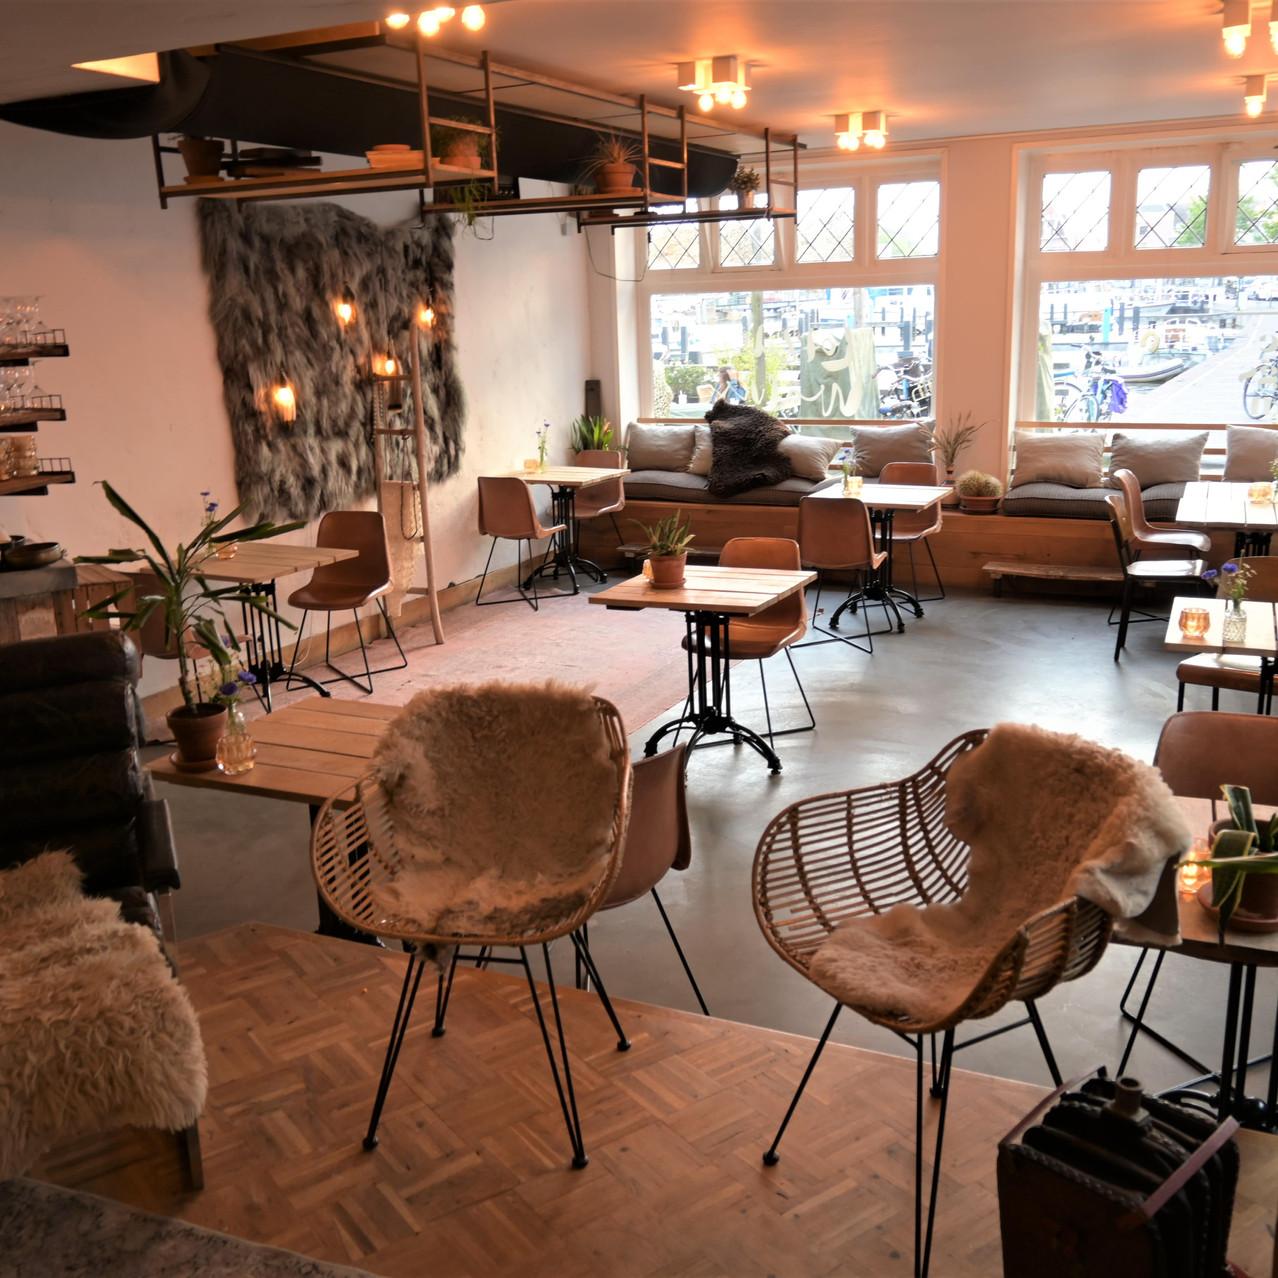 Restaurant Lot & de Walvis inside seating Leiden Netherlands